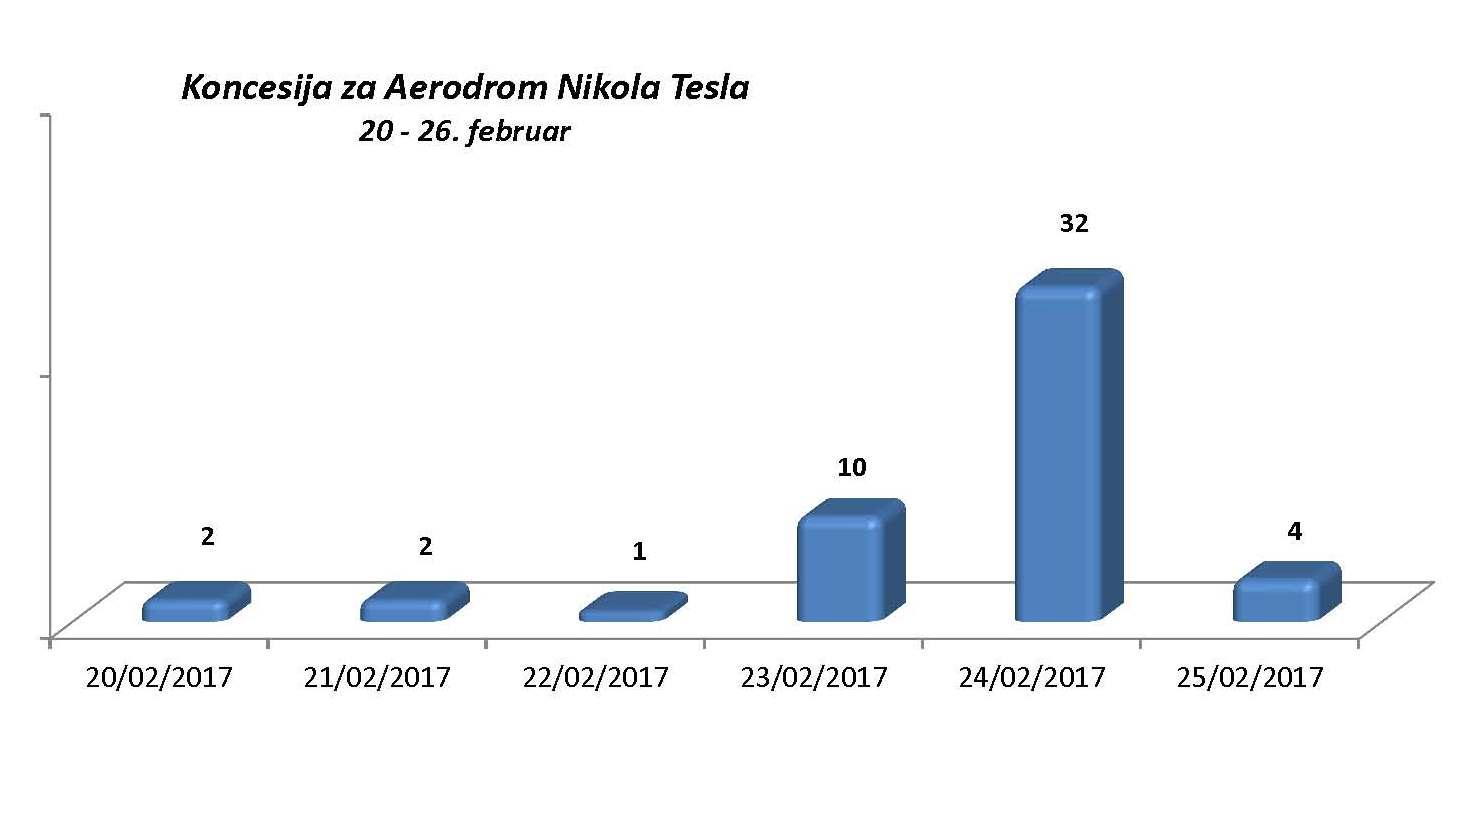 Koncesija za Aerodrom Nikola Tesla